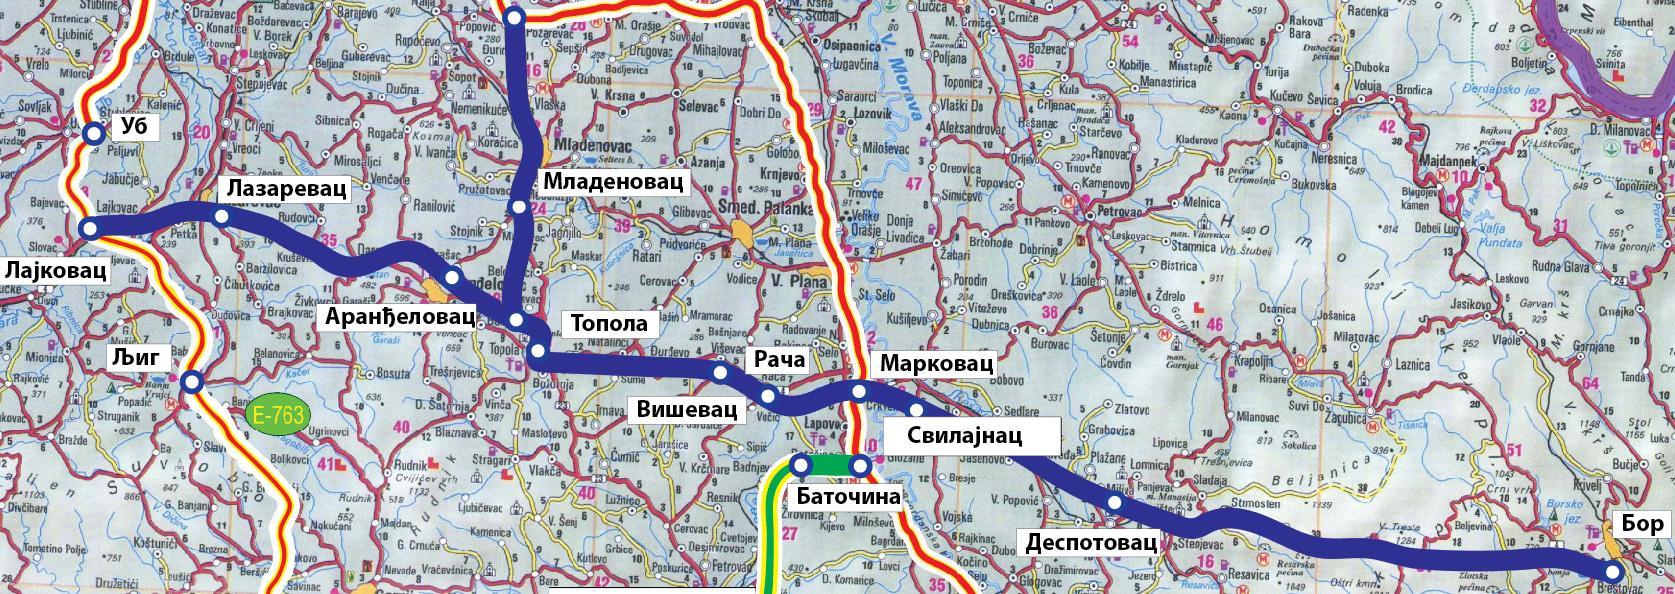 vožd karađorđe spaja istok i zapad srbije